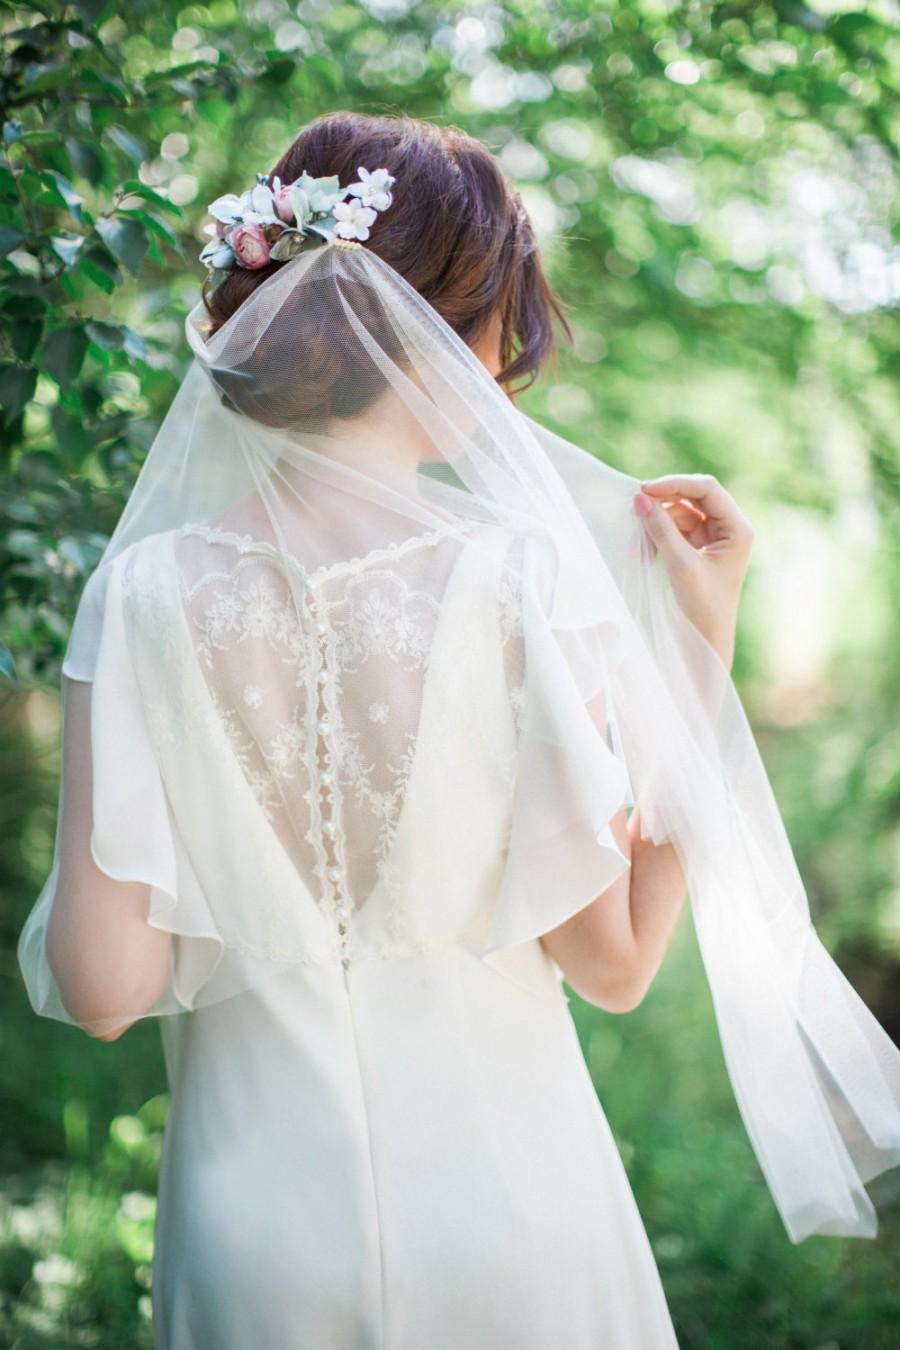 Draped Veil Boho Veil Bohemian Wedding Veil Boho Bridal Headpiece Tulle Veil Soft Tulle Veil Wedding Veil Ivory Bridal Veil Colors 2621044 Weddbook